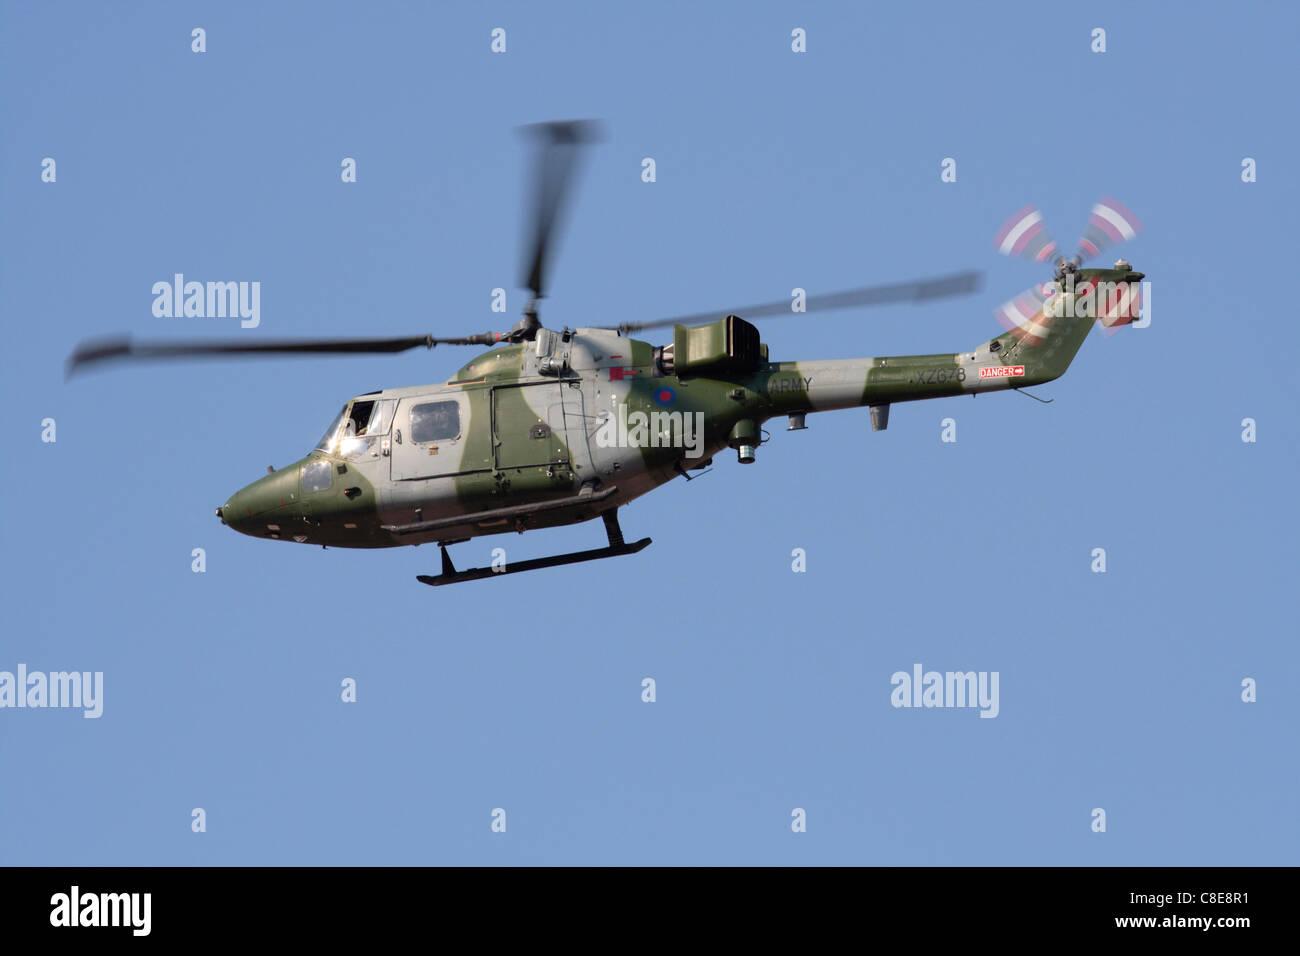 British Army Westland Lynx - Stock Image